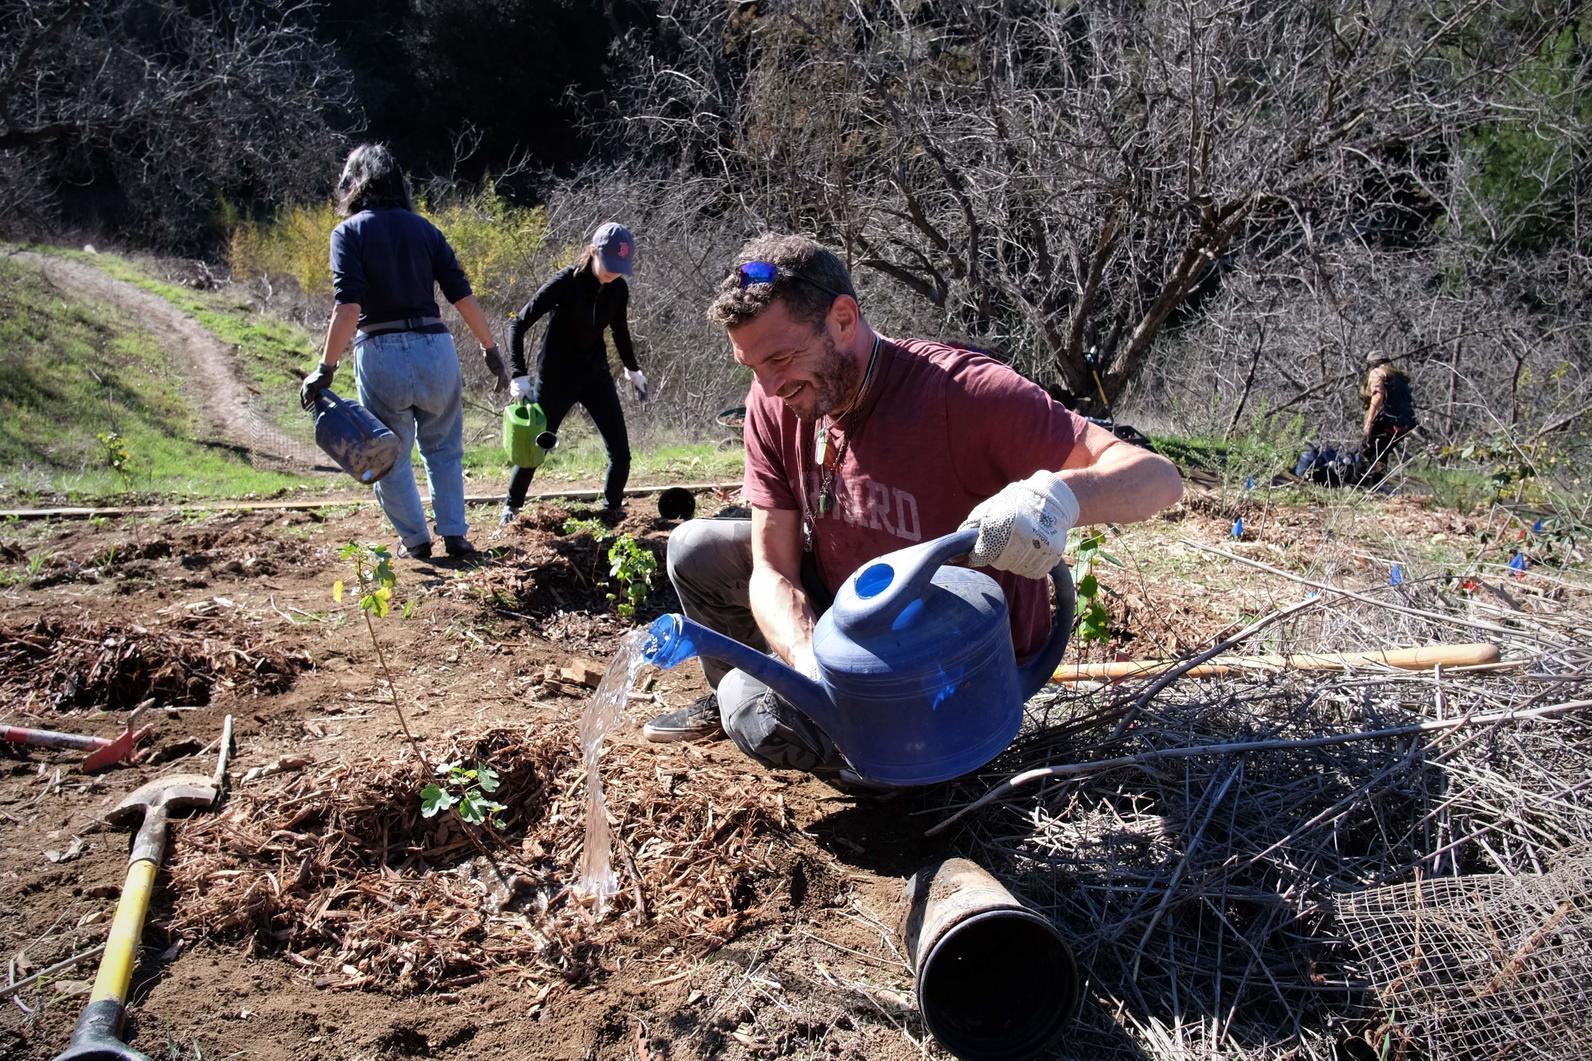 Volunteer maintaining native plants at Debs Park